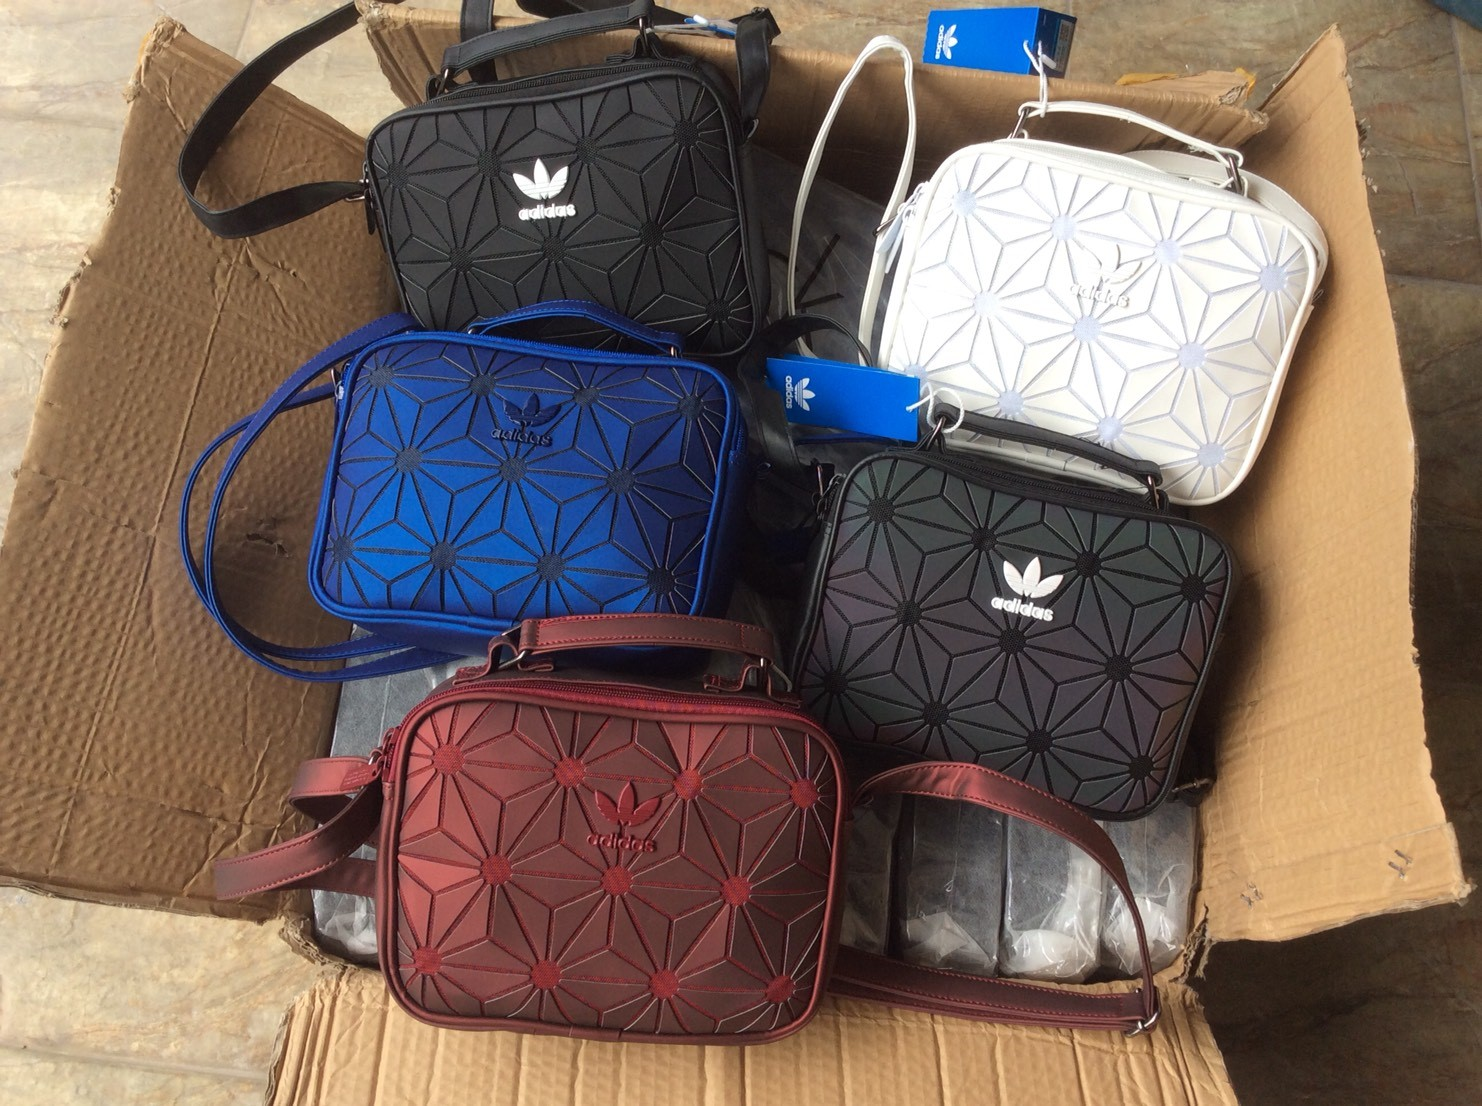 ee0e6346d6b8 Adidas Originals 3D Mini Airline (ISSEY MIYAKE Style Shoulder Bag)  กระเป๋าสะพายรุ่นใหม่ดีไซน์สุดฮิต